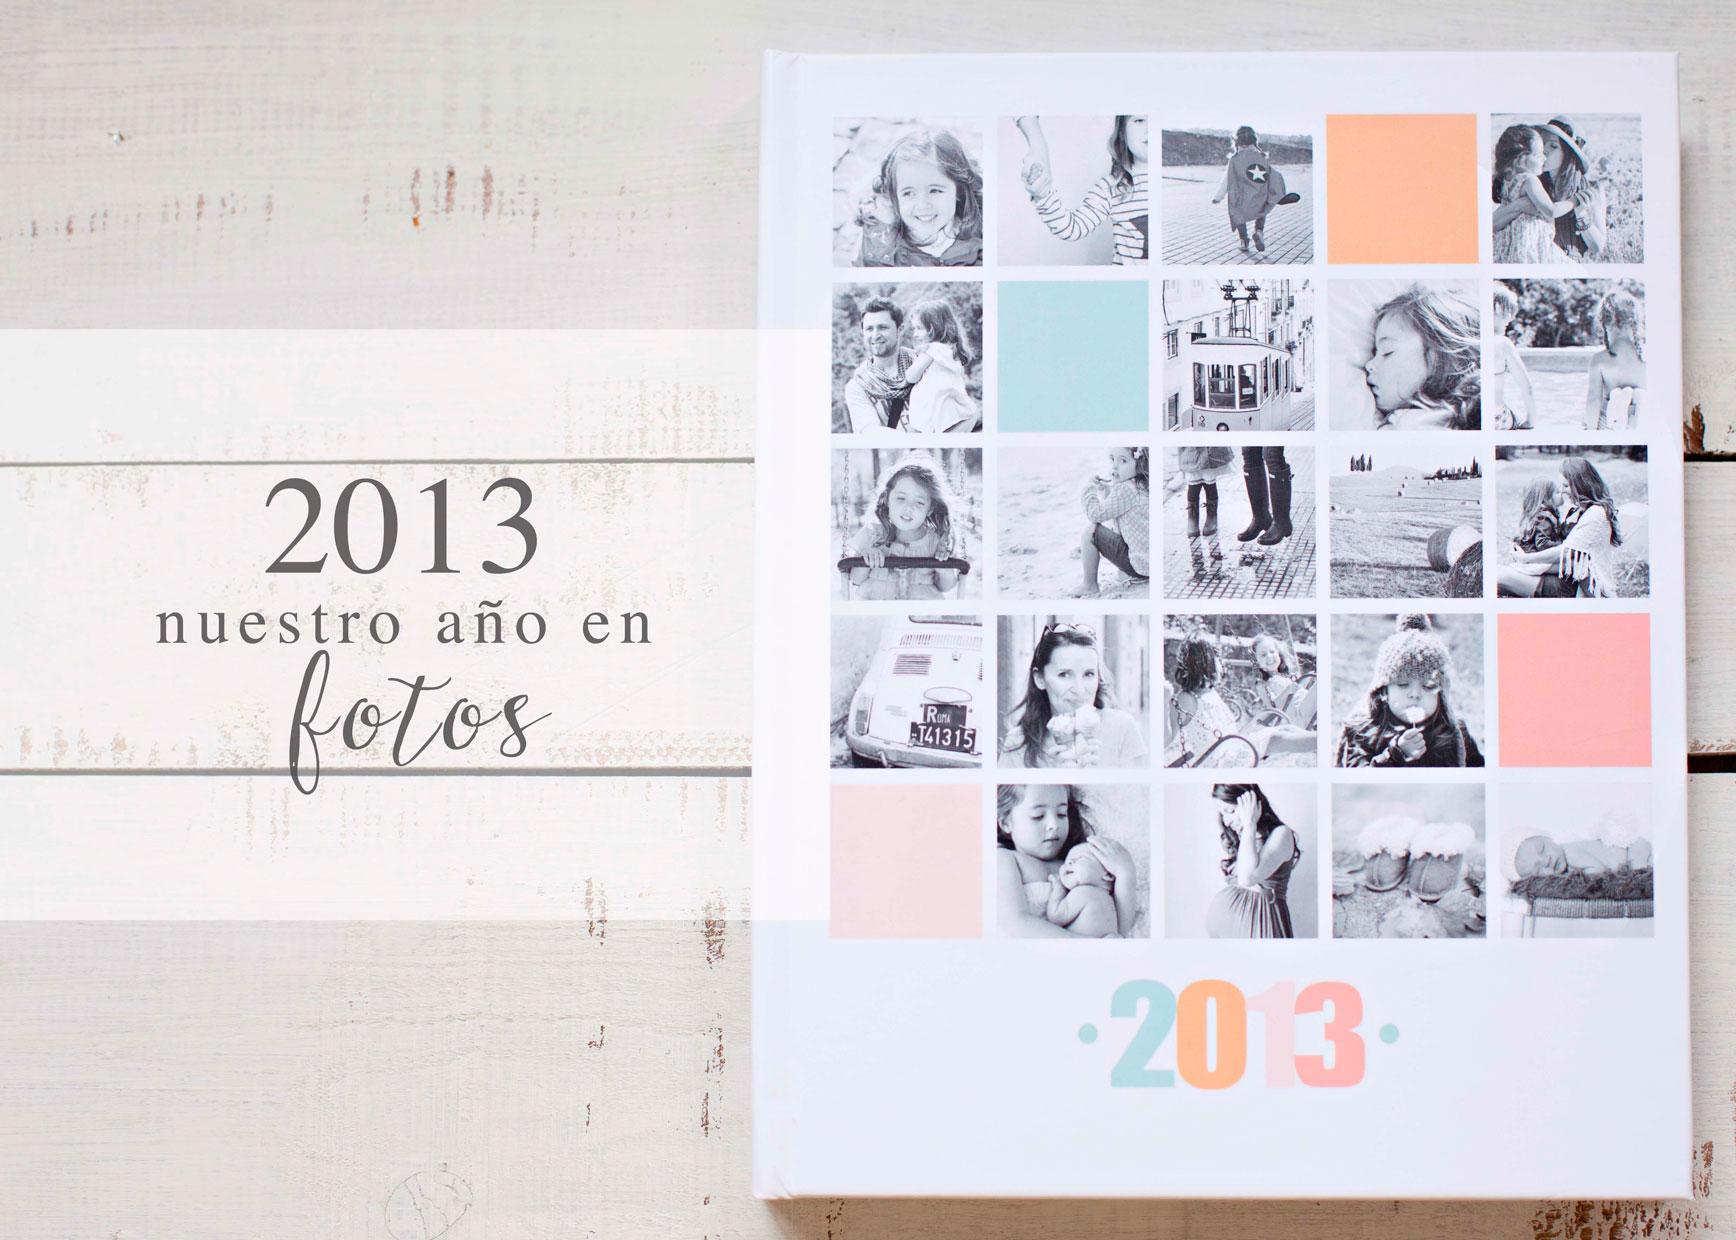 libro fotos blurb